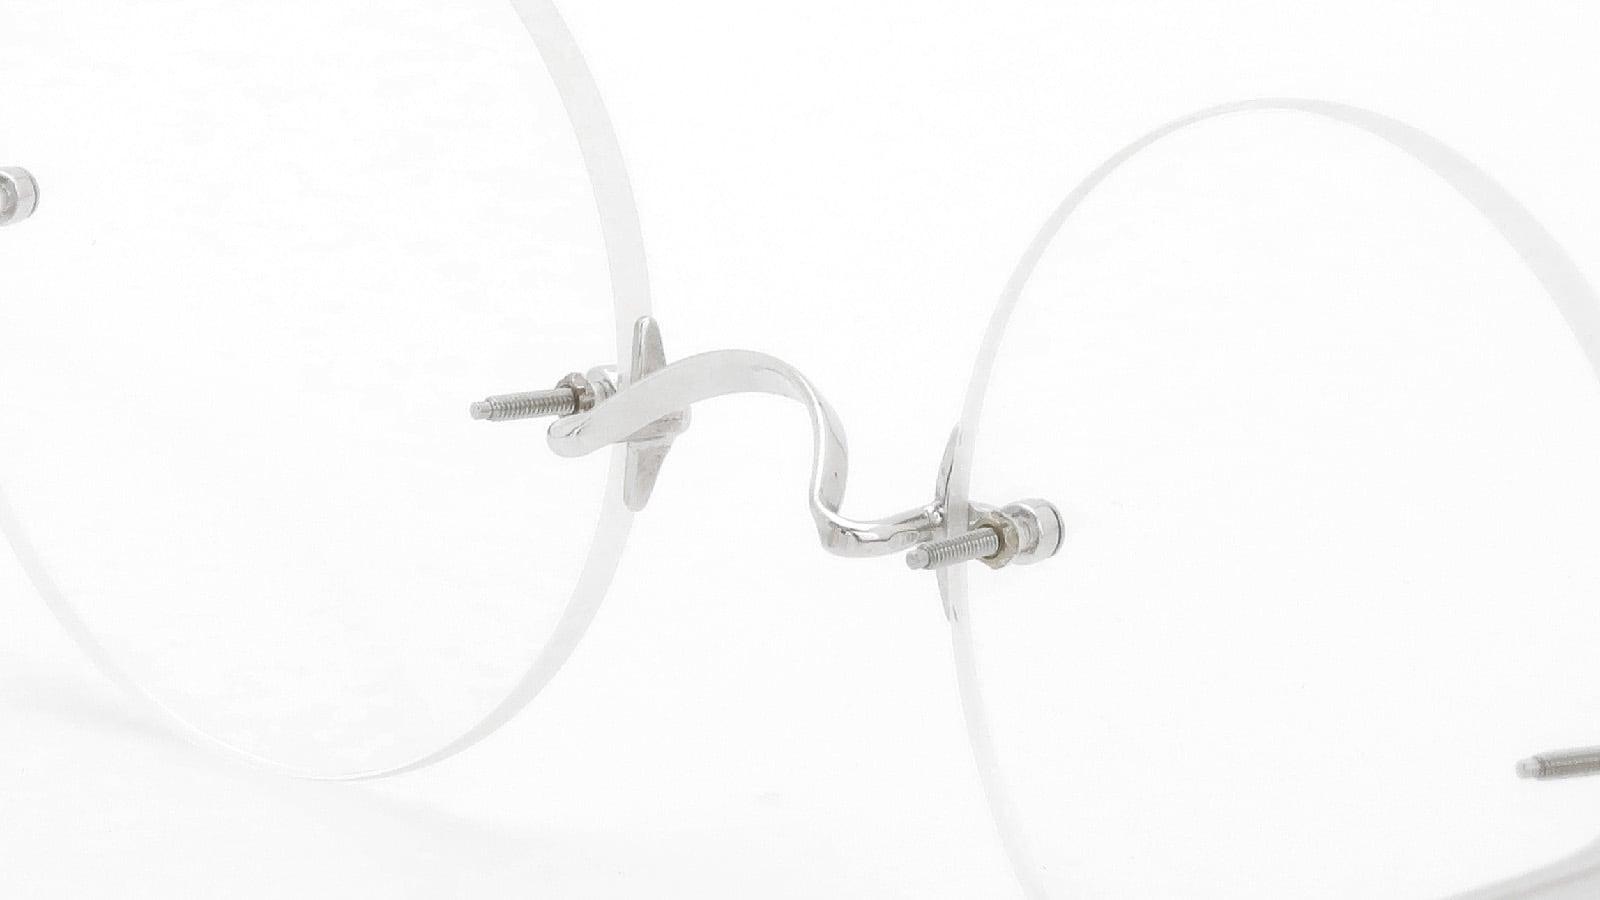 GERNOT LINDNER GL400 mod.401 col.SN (Silver without-coating) 8